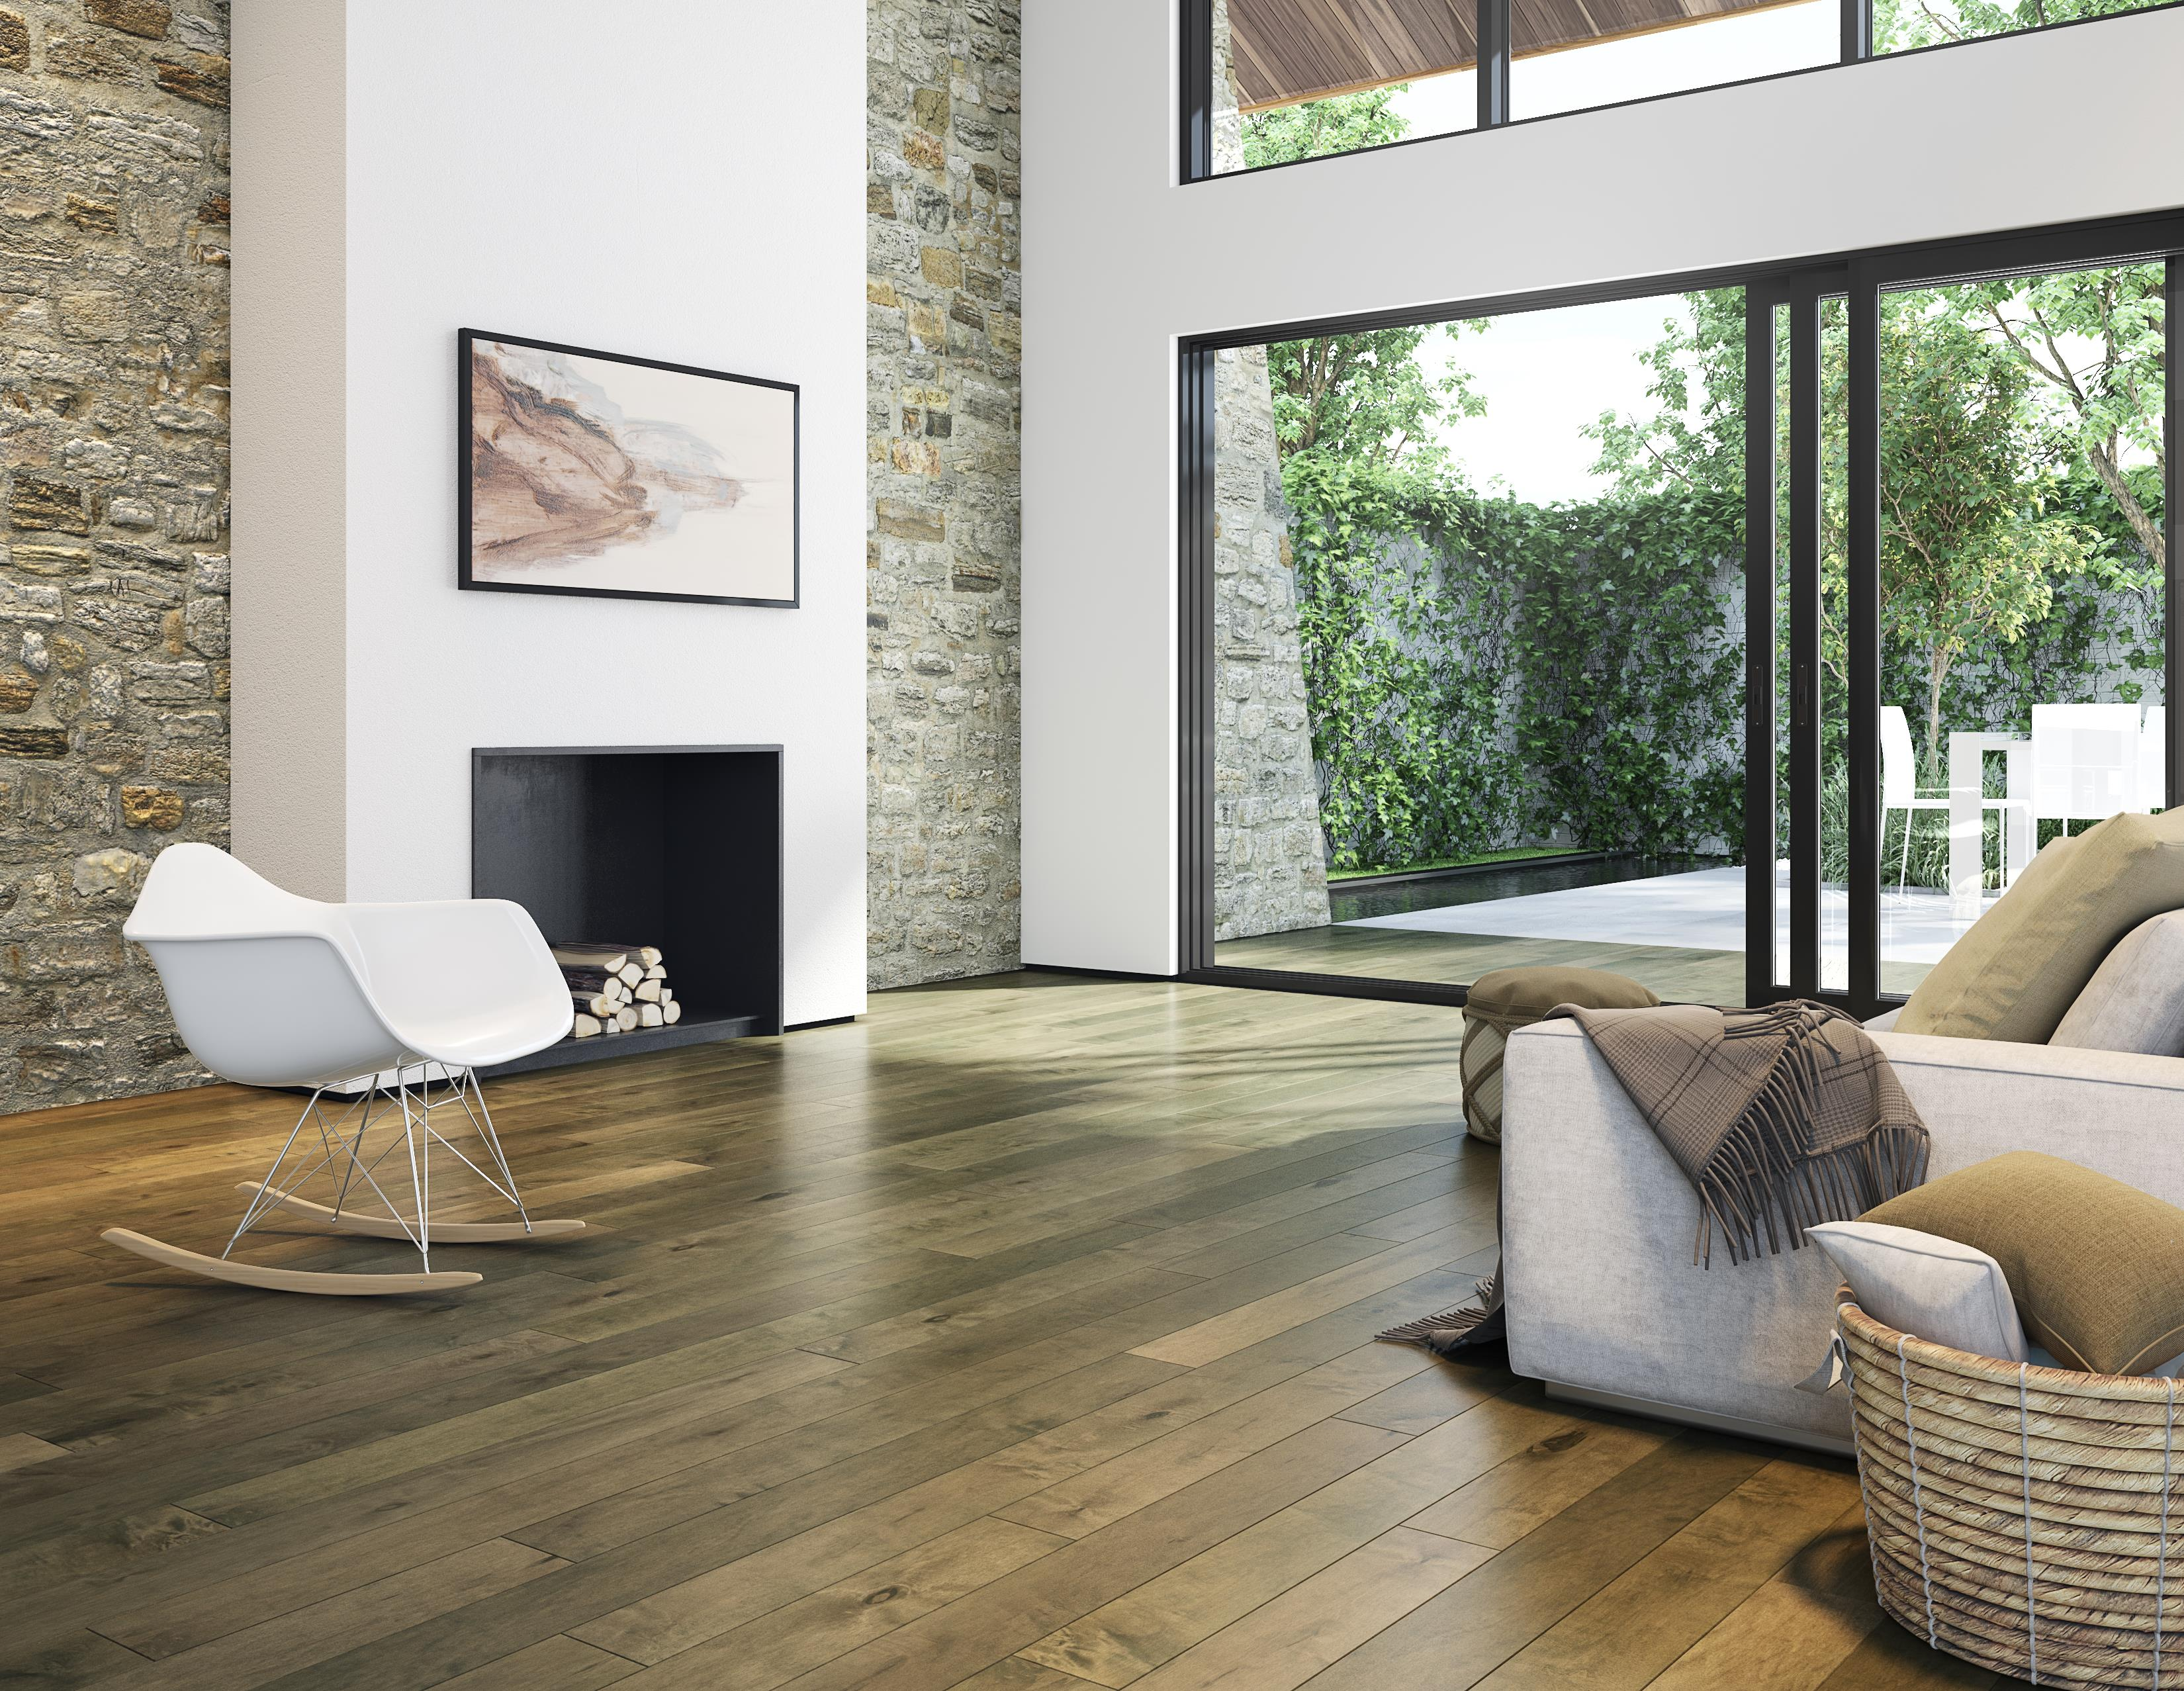 New living room flooring installed by hardwood floor store Bode Floors in Columbia, MD